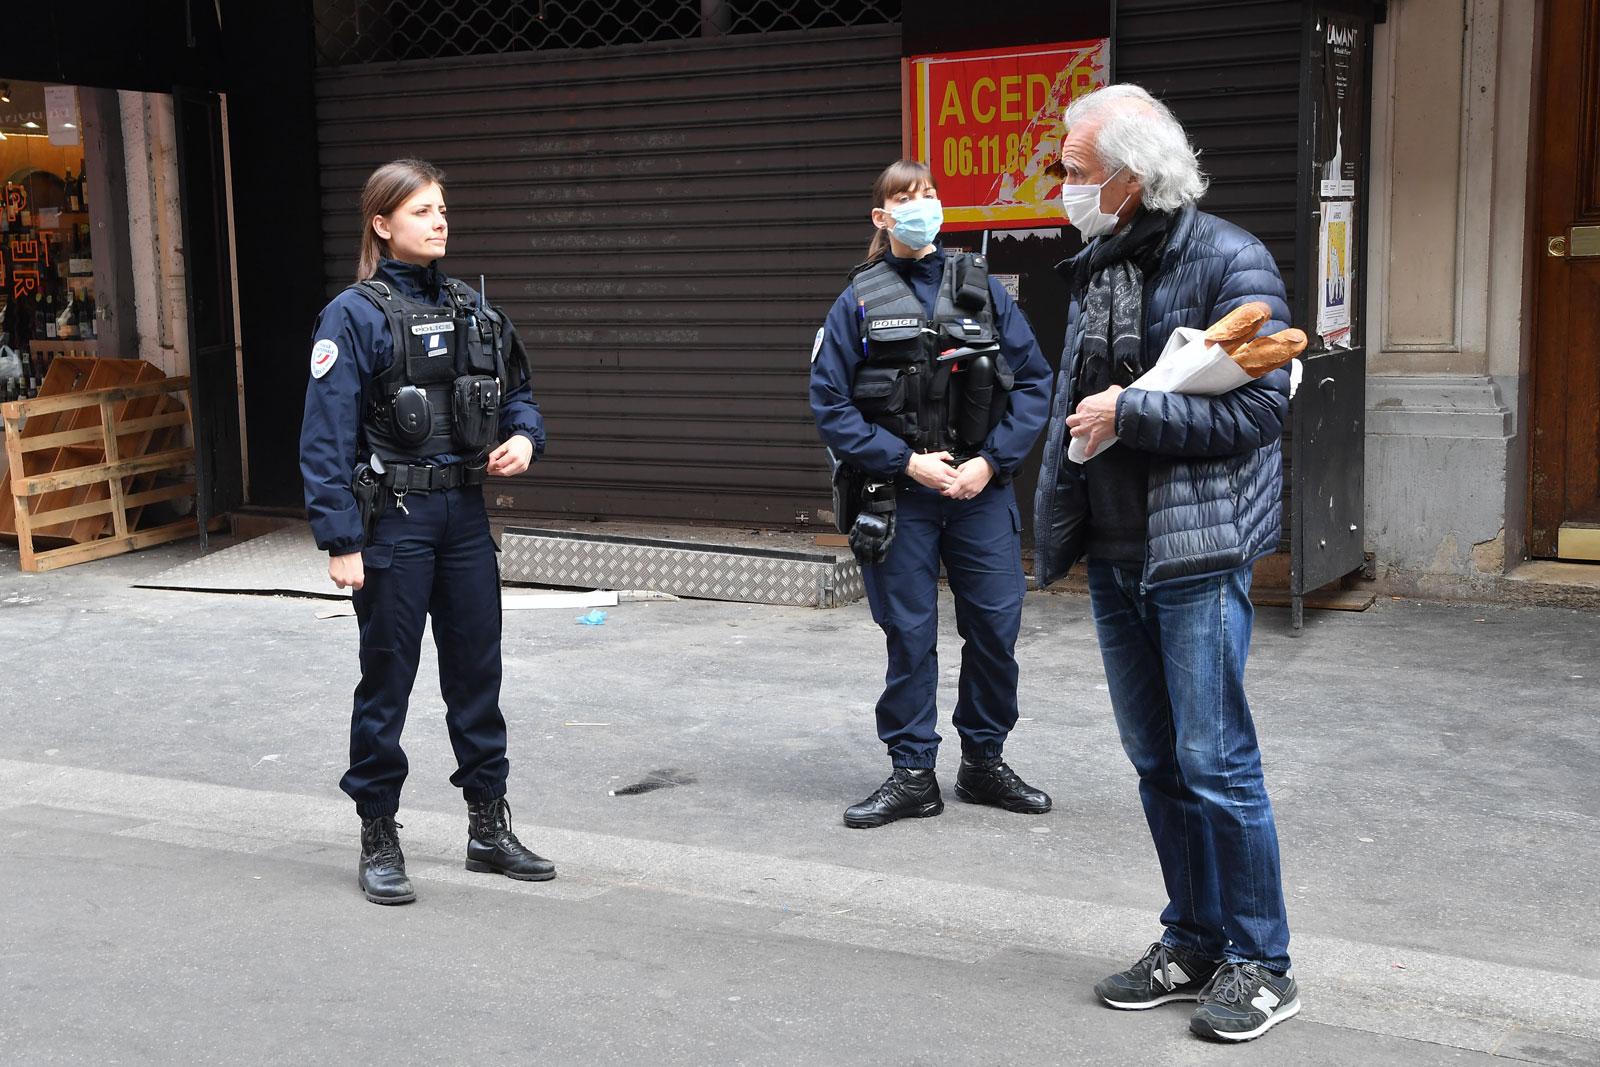 Paris under Covid-19 lockdown